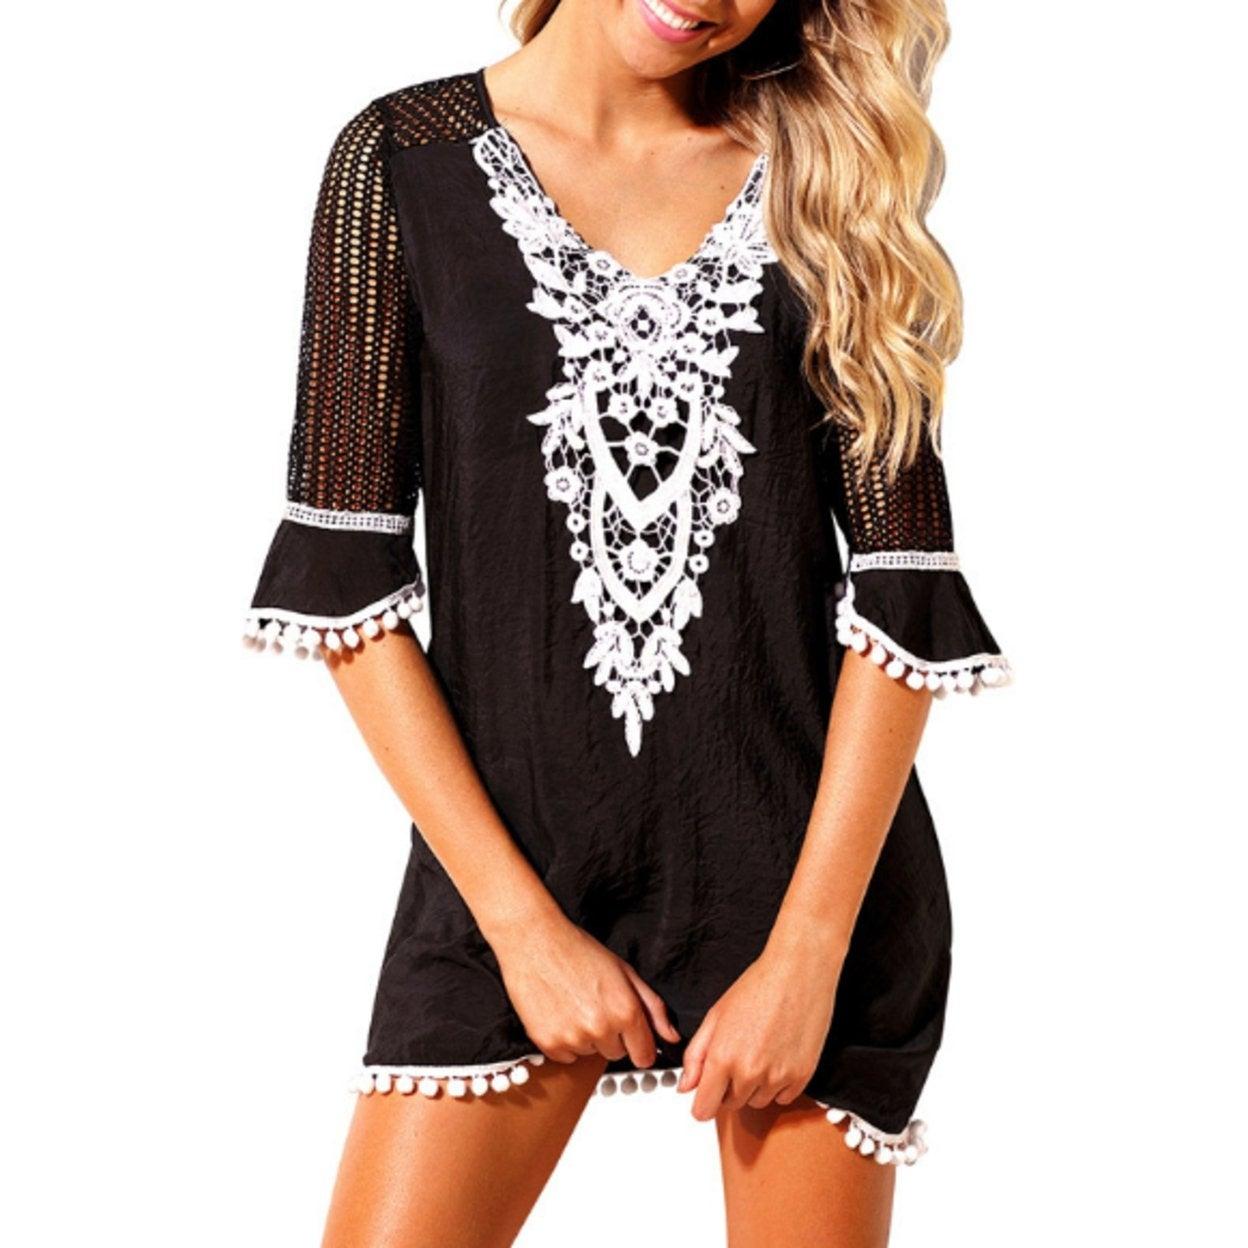 8bd3bbf22d Shop Women's Crochet Chiffon Tassel Swimsuit Bikini Pom Pom Trim Swimwear  Beach Cover Up - On Sale - Free Shipping On Orders Over $45 - Overstock -  27513350